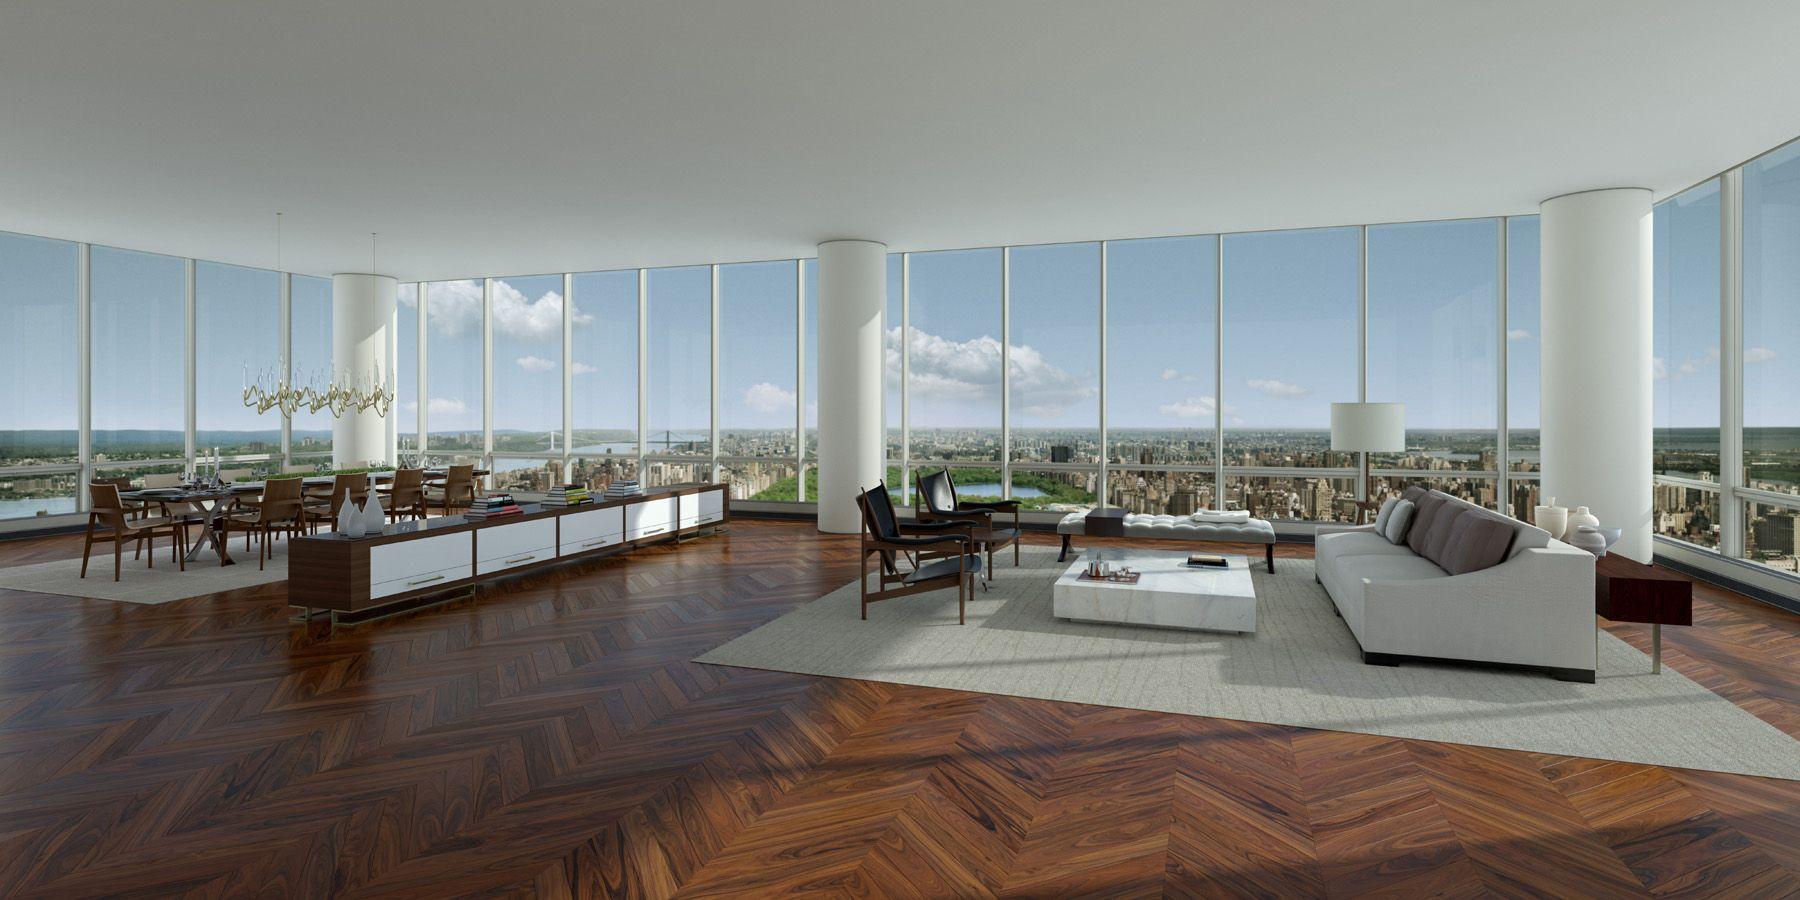 Inside Huge Houses inside billionaires homes - google search | dream homes and